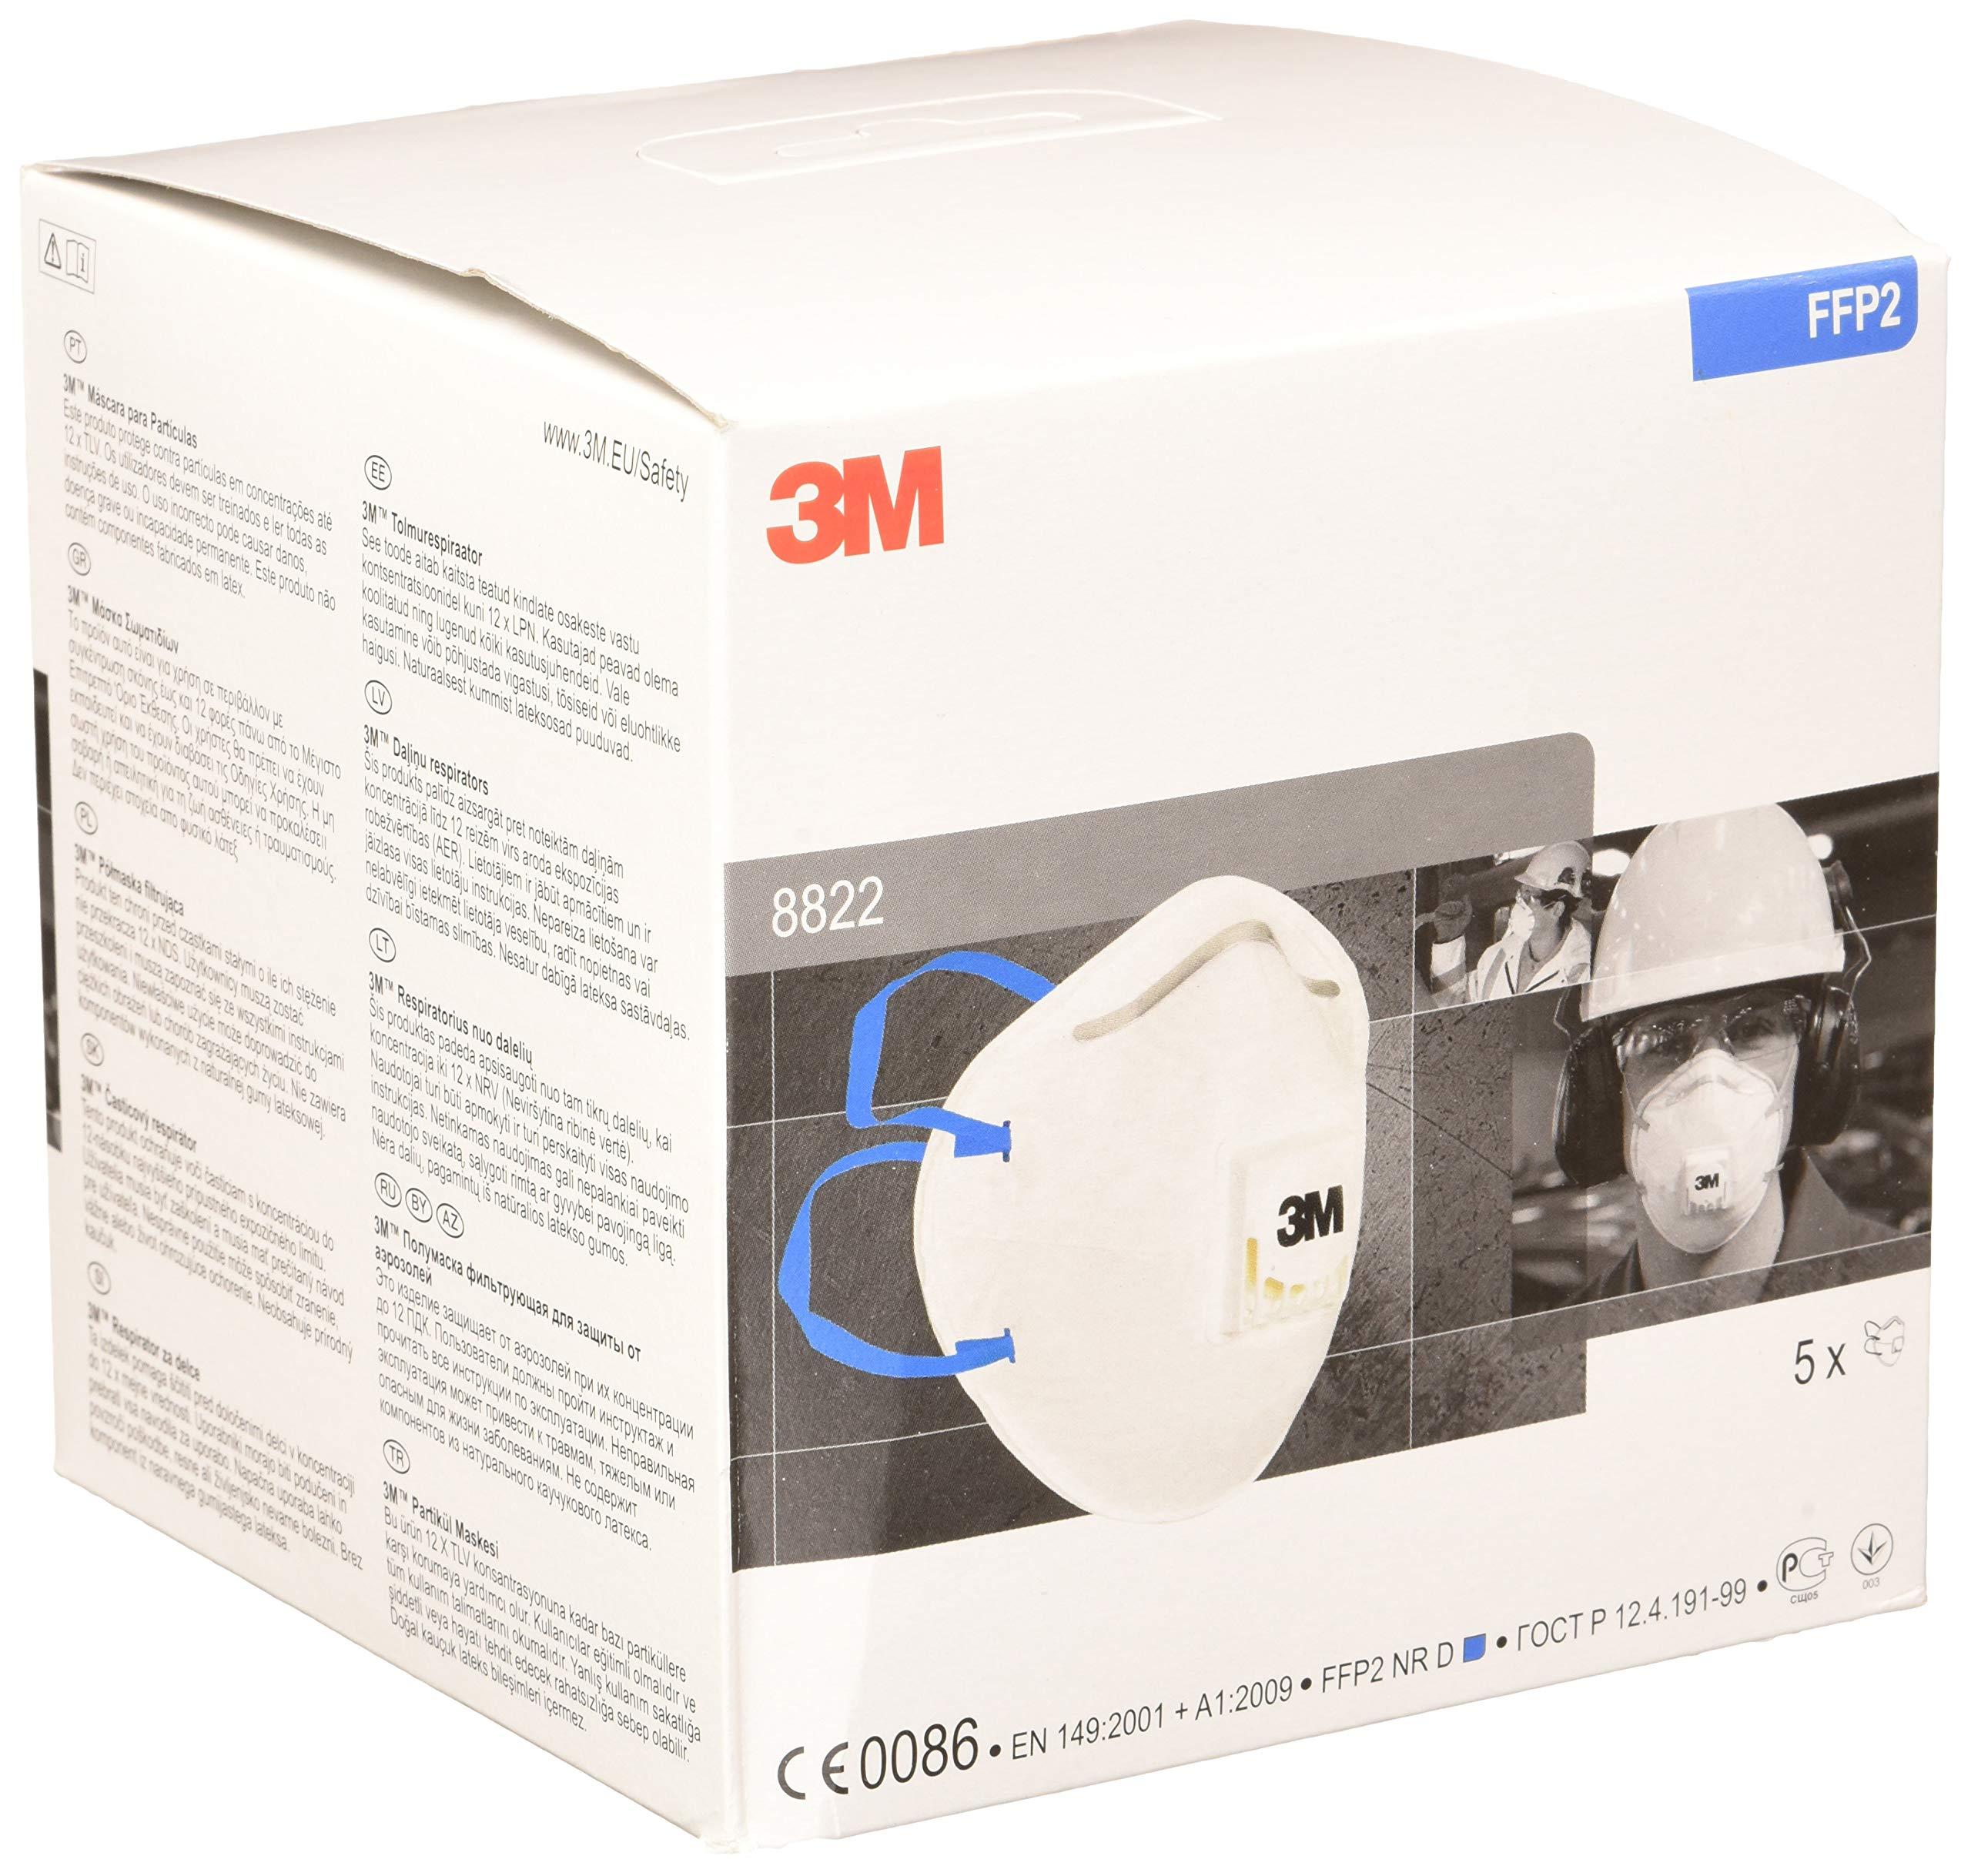 respiratore 3m ffp2